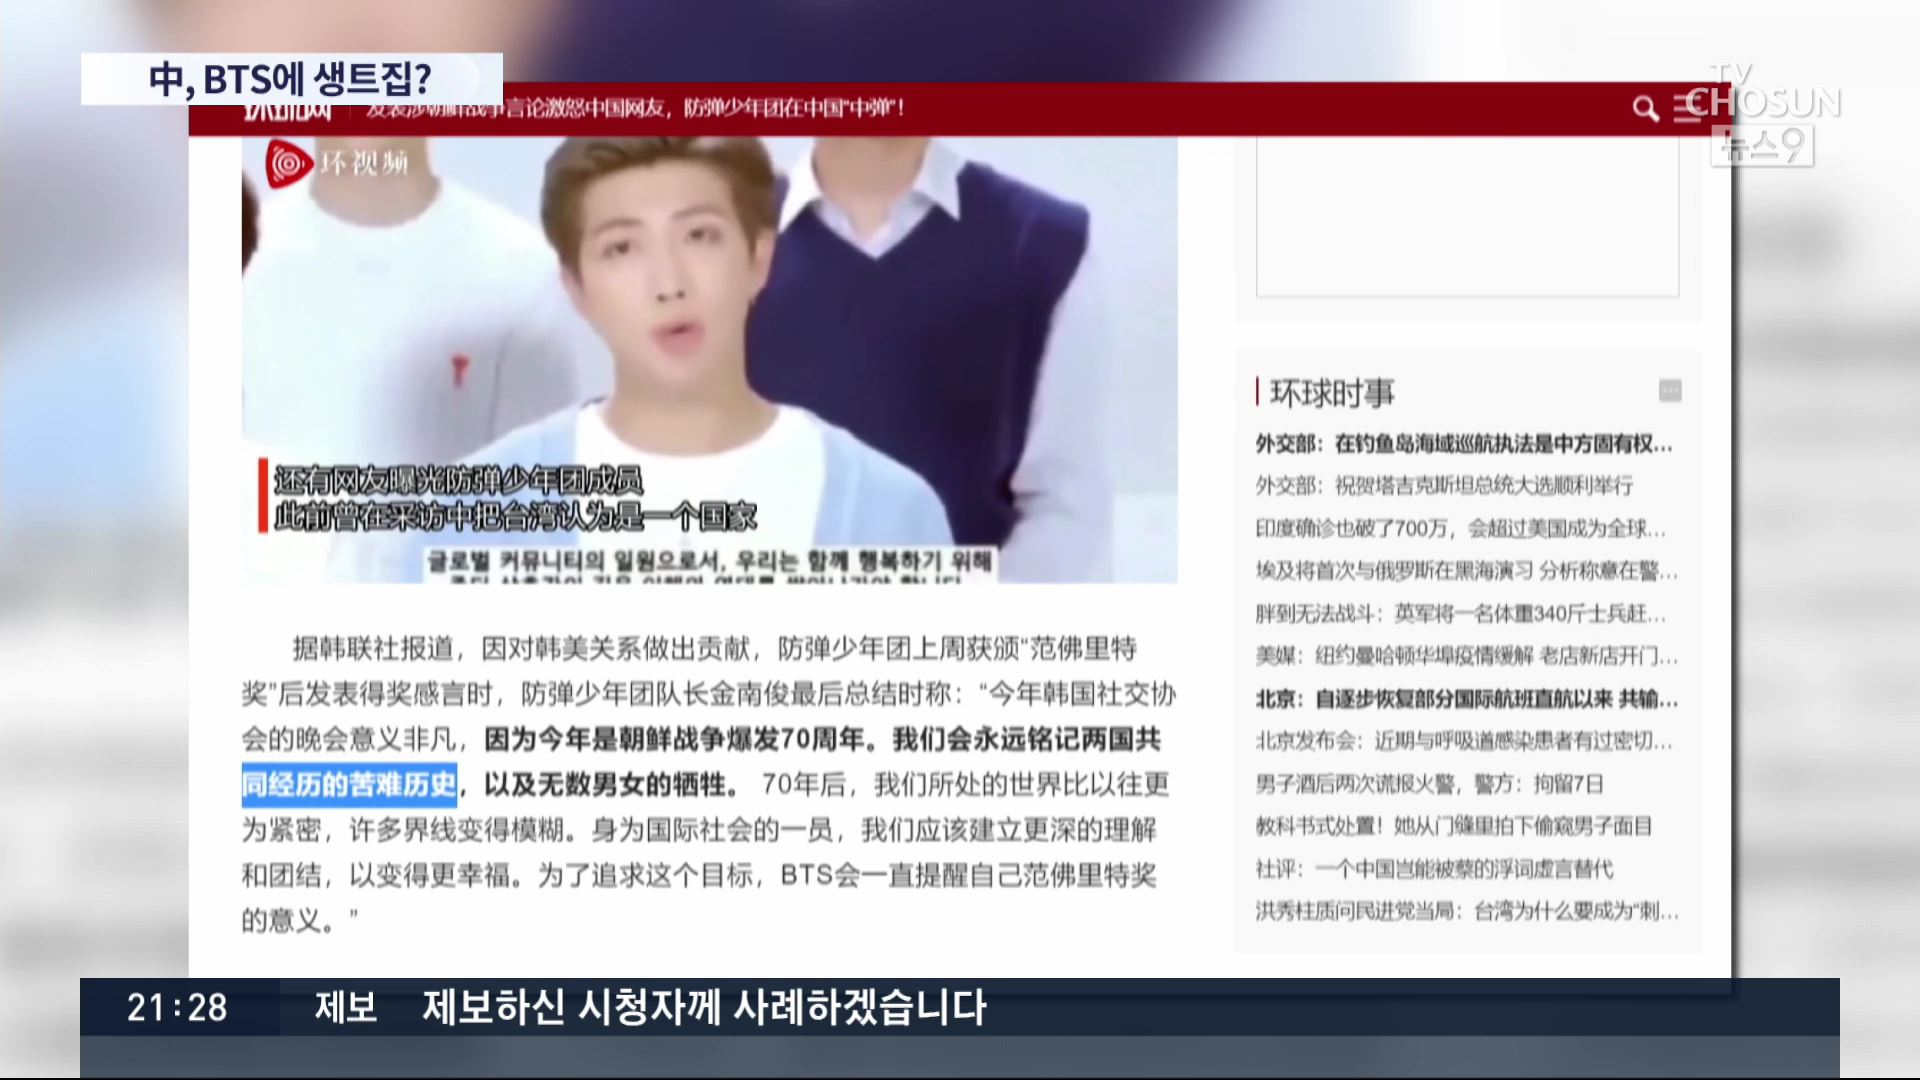 BTS '한국전쟁' 발언이 모욕?…中 누리꾼들 '한국산 불매'